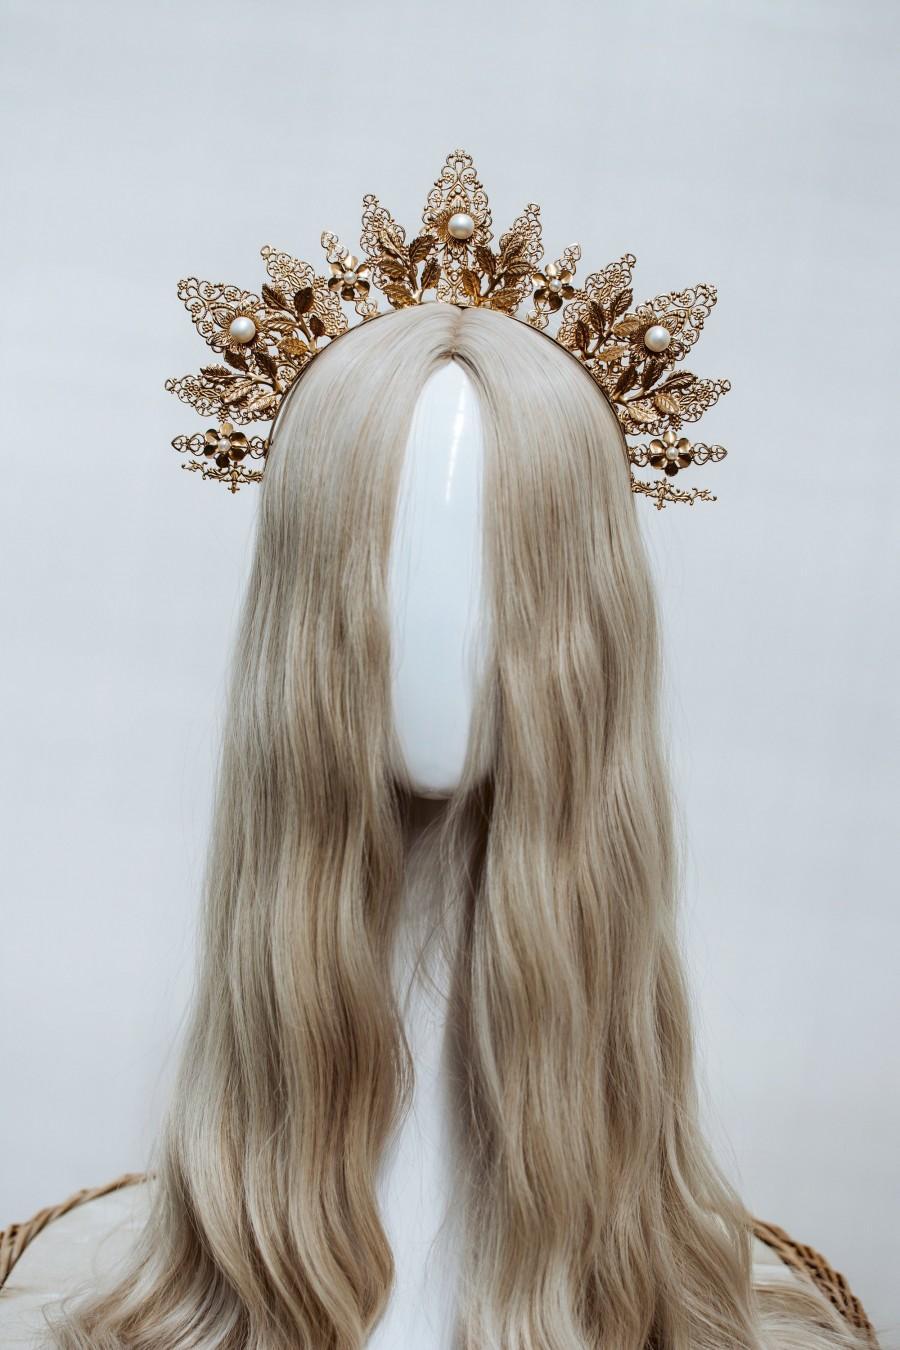 Wedding - Gold crown, Gold Headpiece, Gold Flower Crown, Boho Wedding, Boho Wedding Crown, Halo Headband, Wedding Tiara, Boho Hair Style, Halo Crown